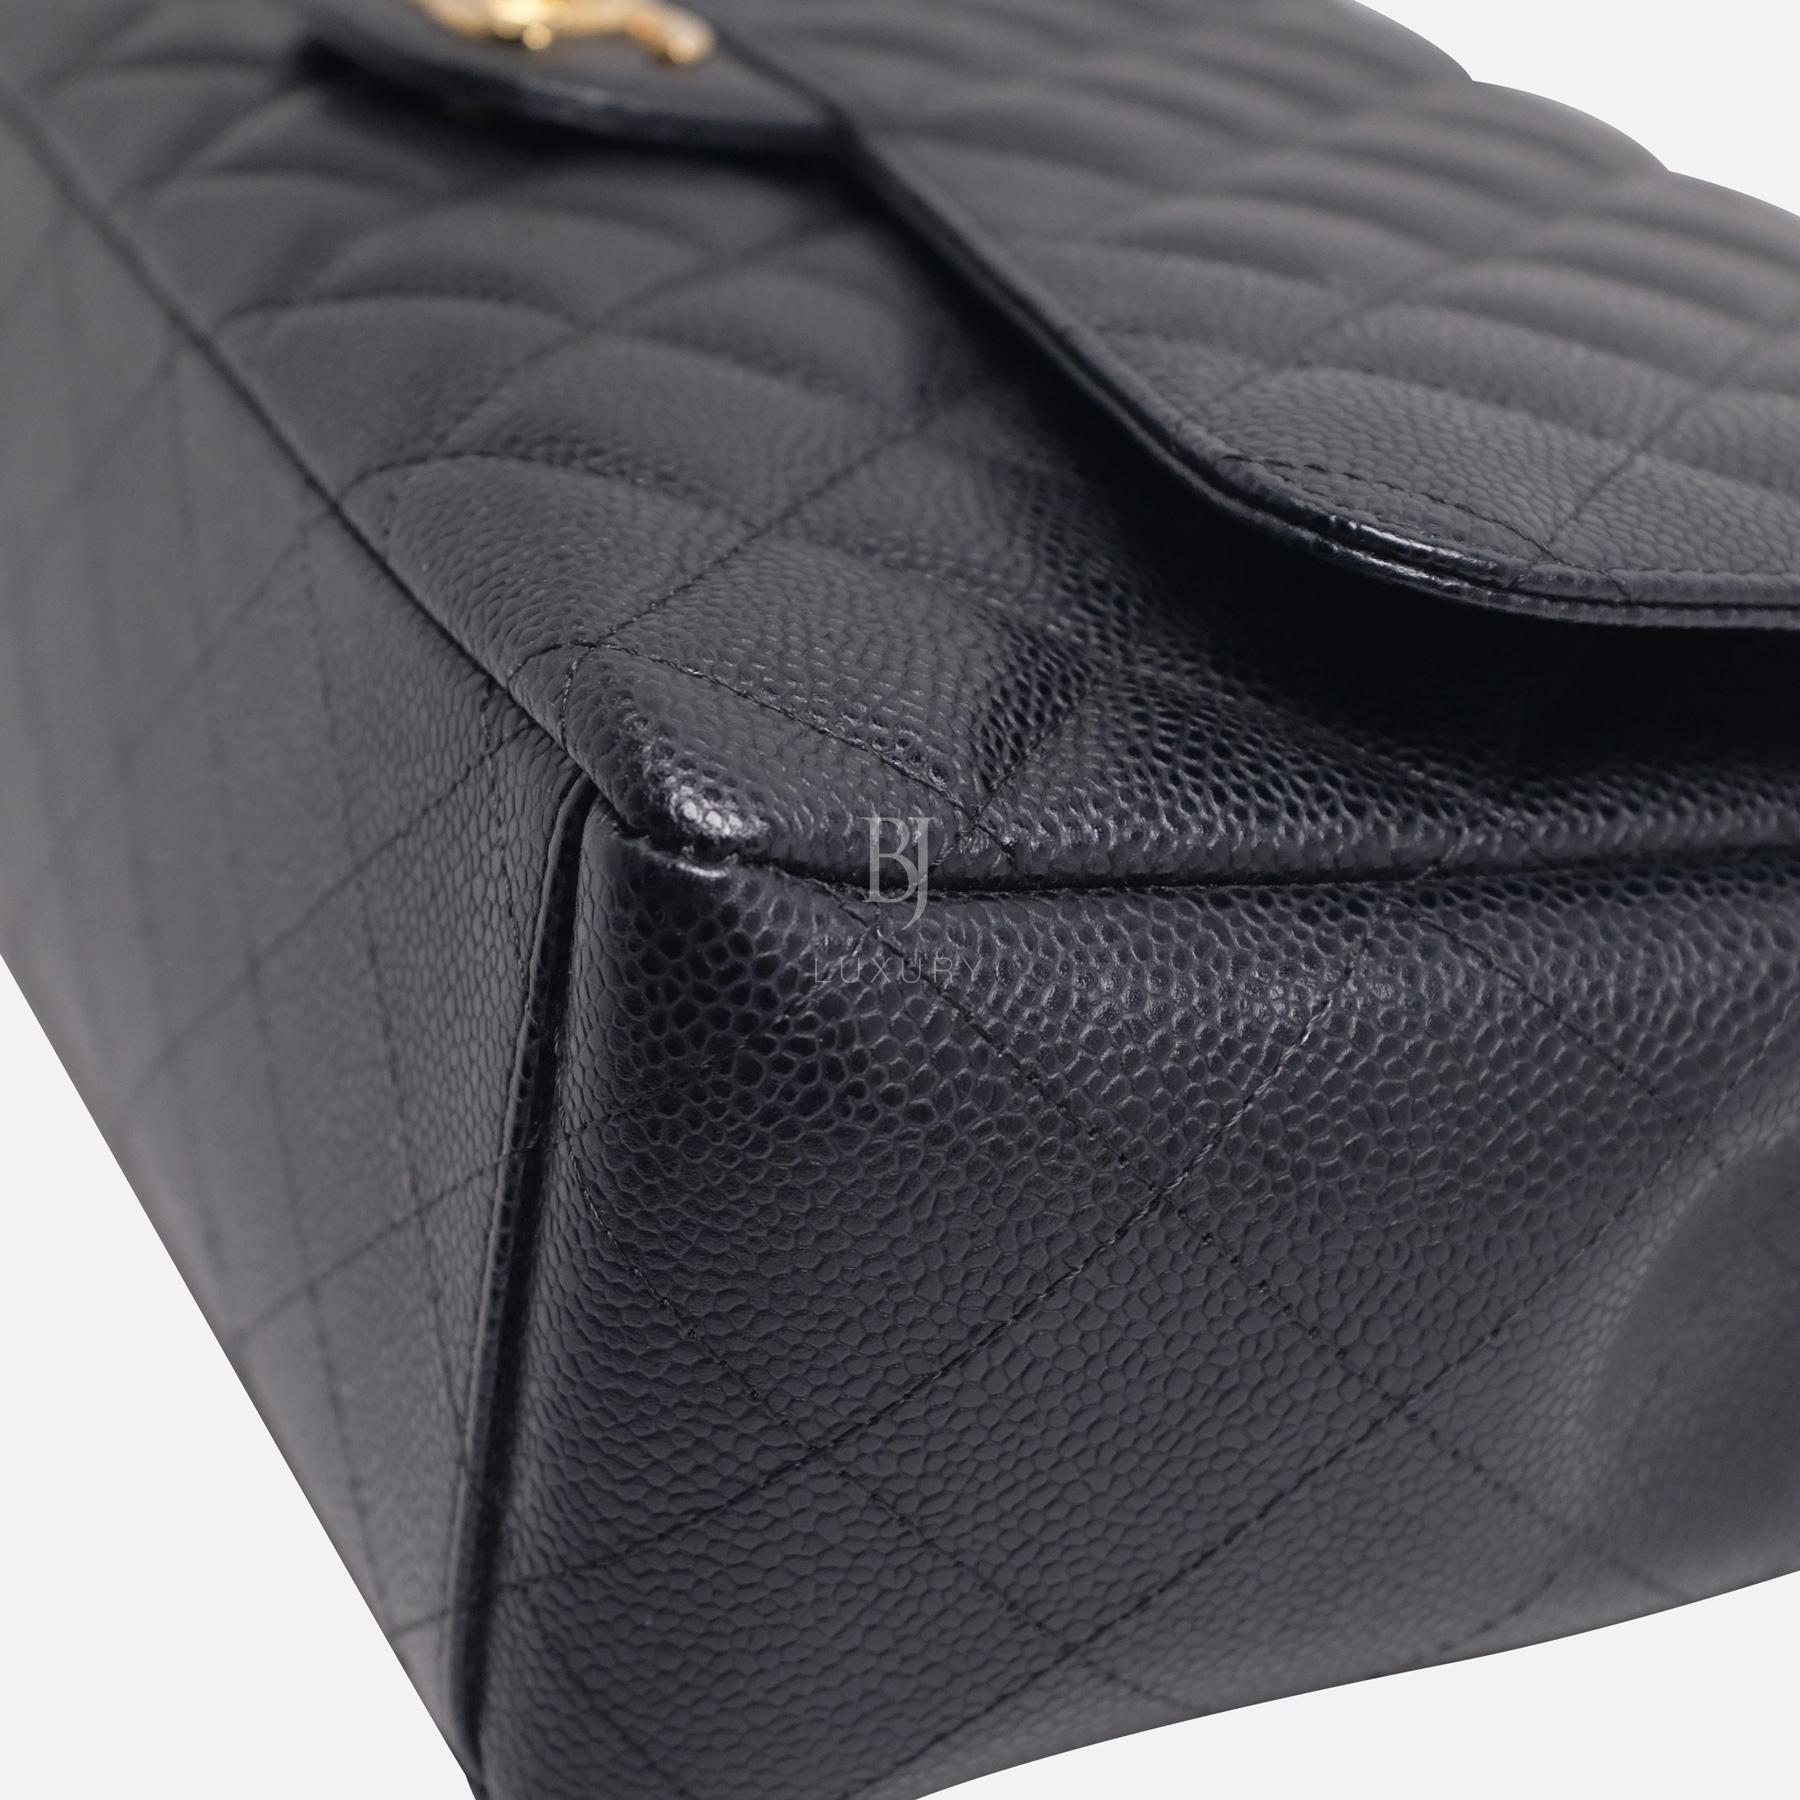 Chanel Classic Handbag Caviar Maxi Black BJ Luxury 9.jpg